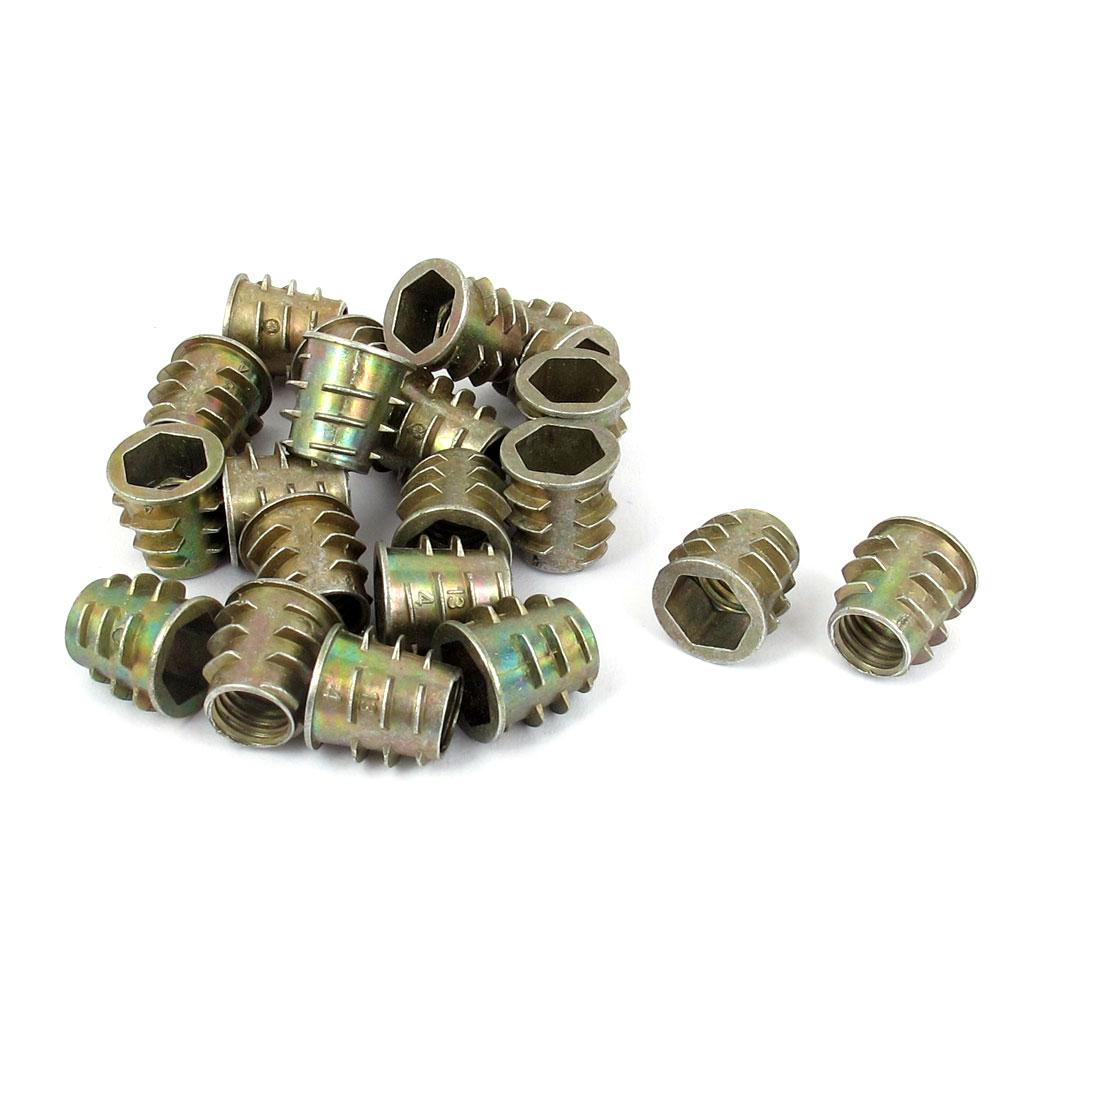 20 Pcs M8x13mm Zinc Plated Hex Socket Screw in Thread Insert Nut for Wood